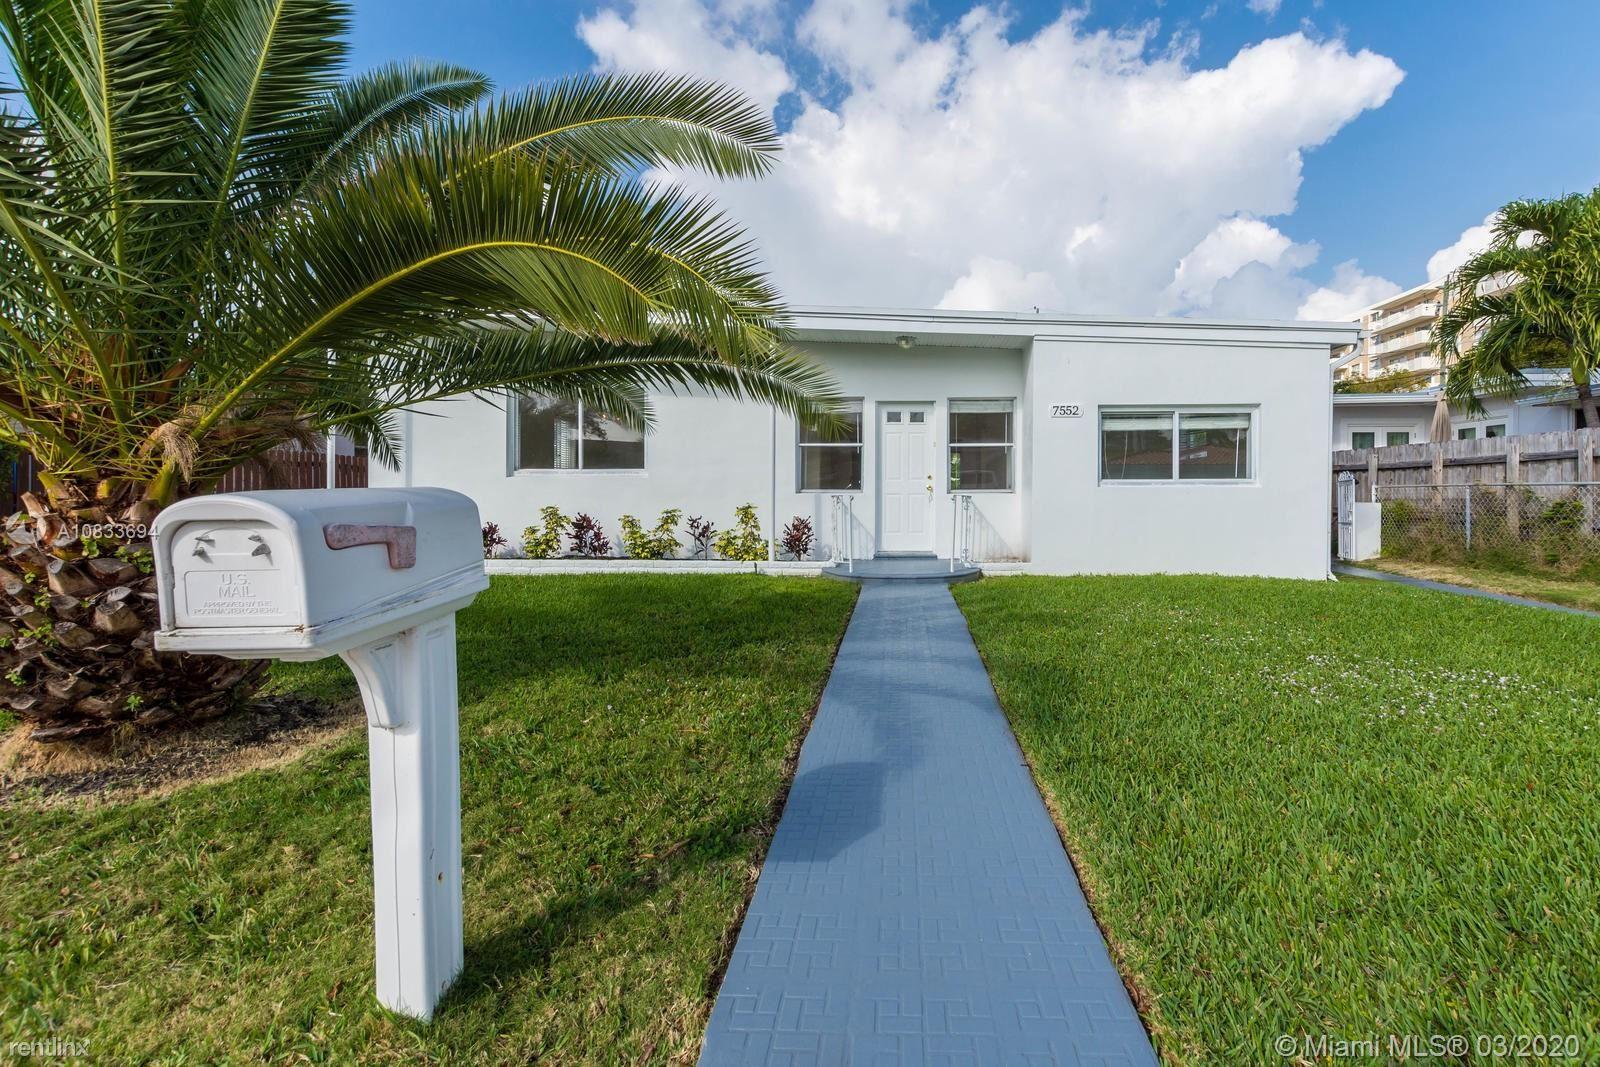 7552 Adventure Ave, North Bay Village, FL - $3,525